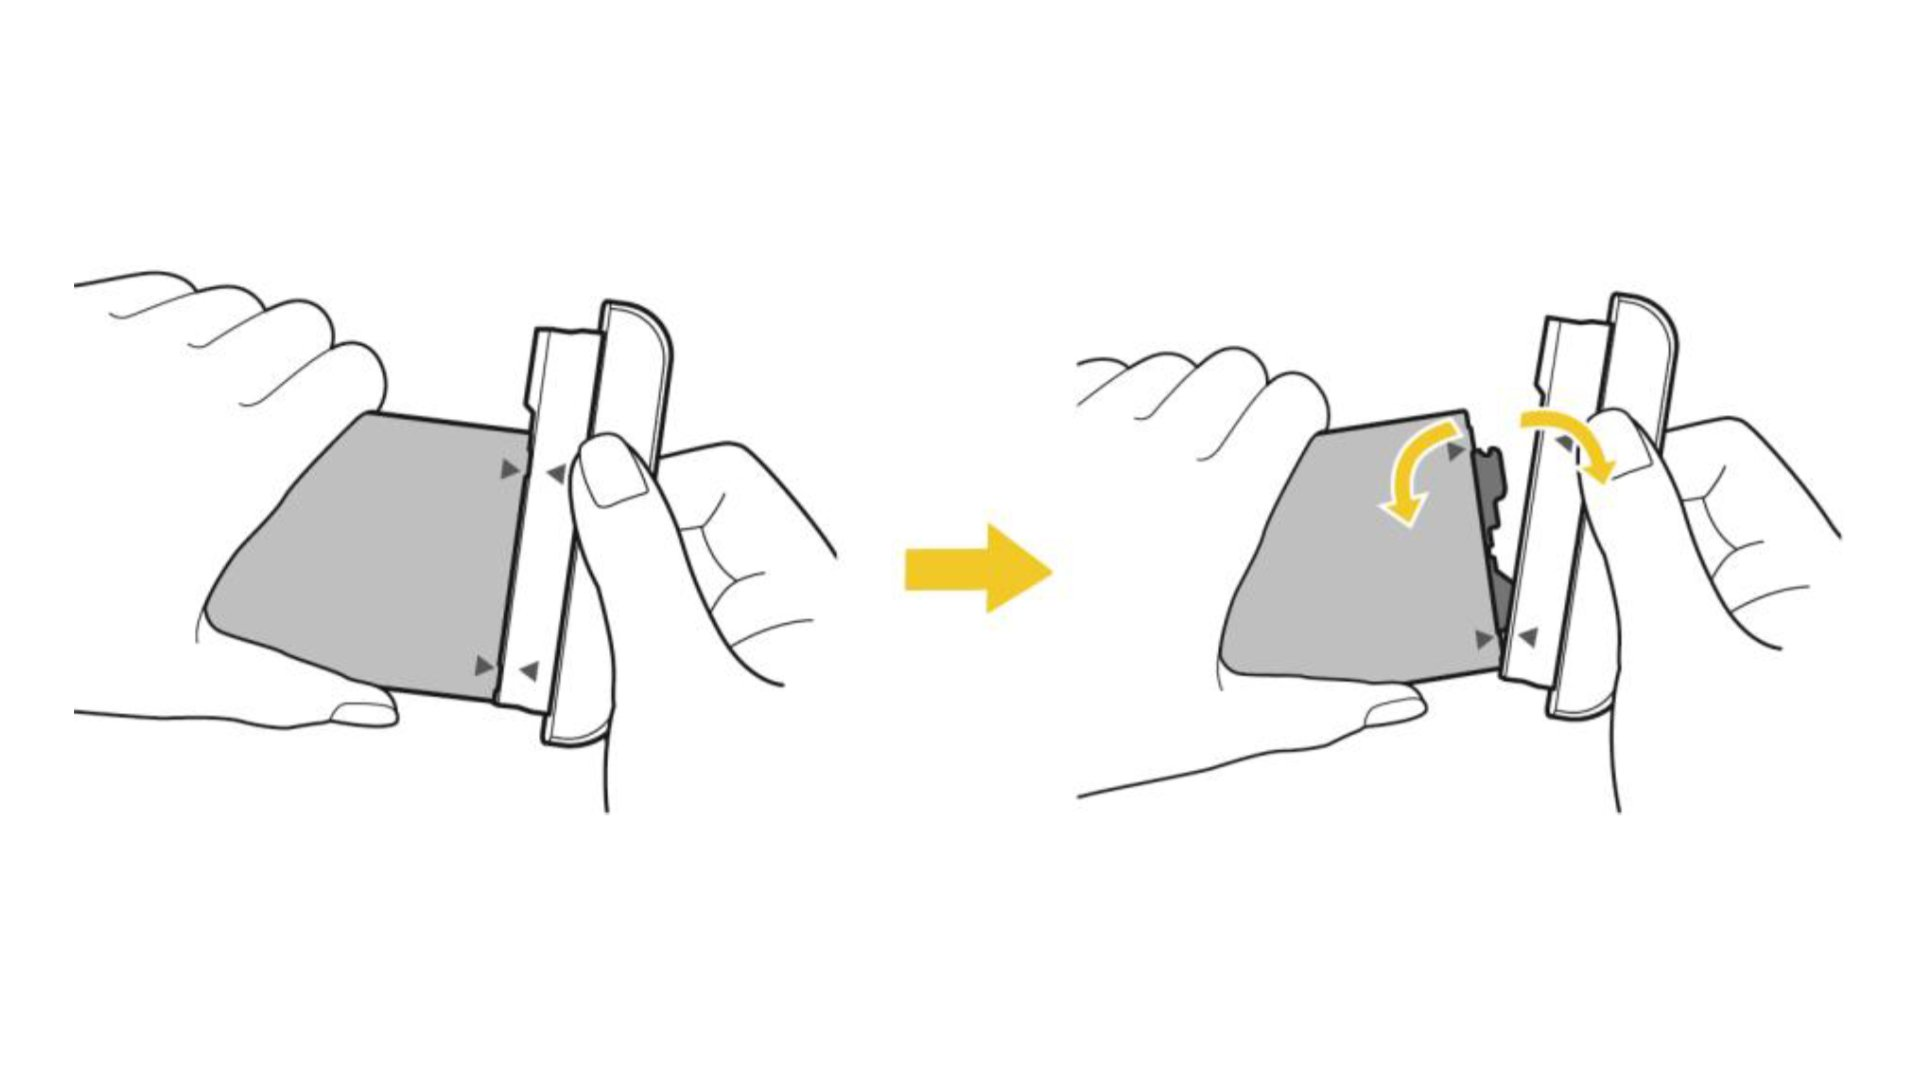 LG G5 - Removing Battery Module